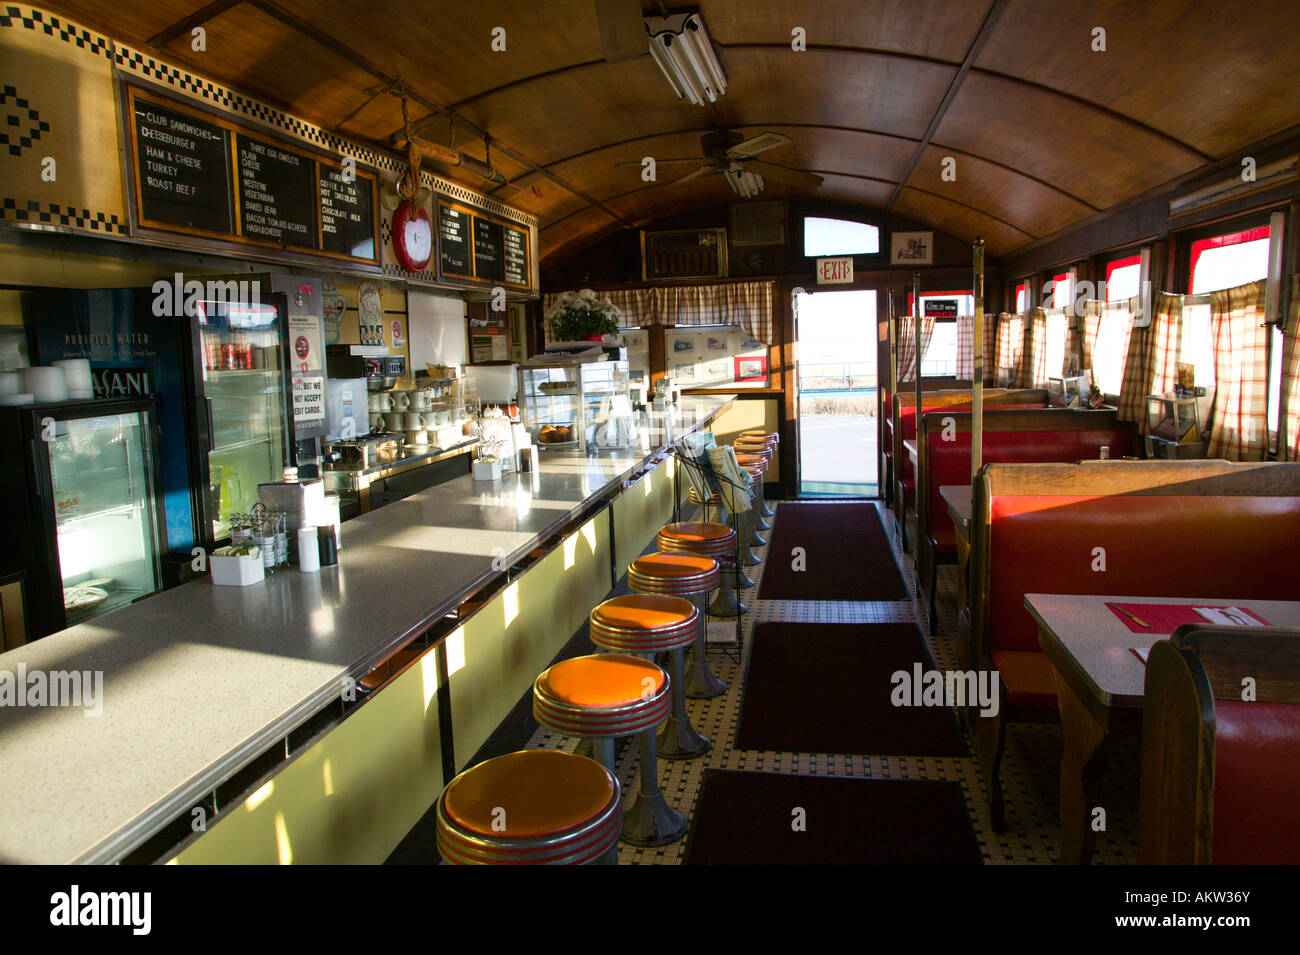 Interior Of Vintage Diner Restaurant Stock Photo Alamy